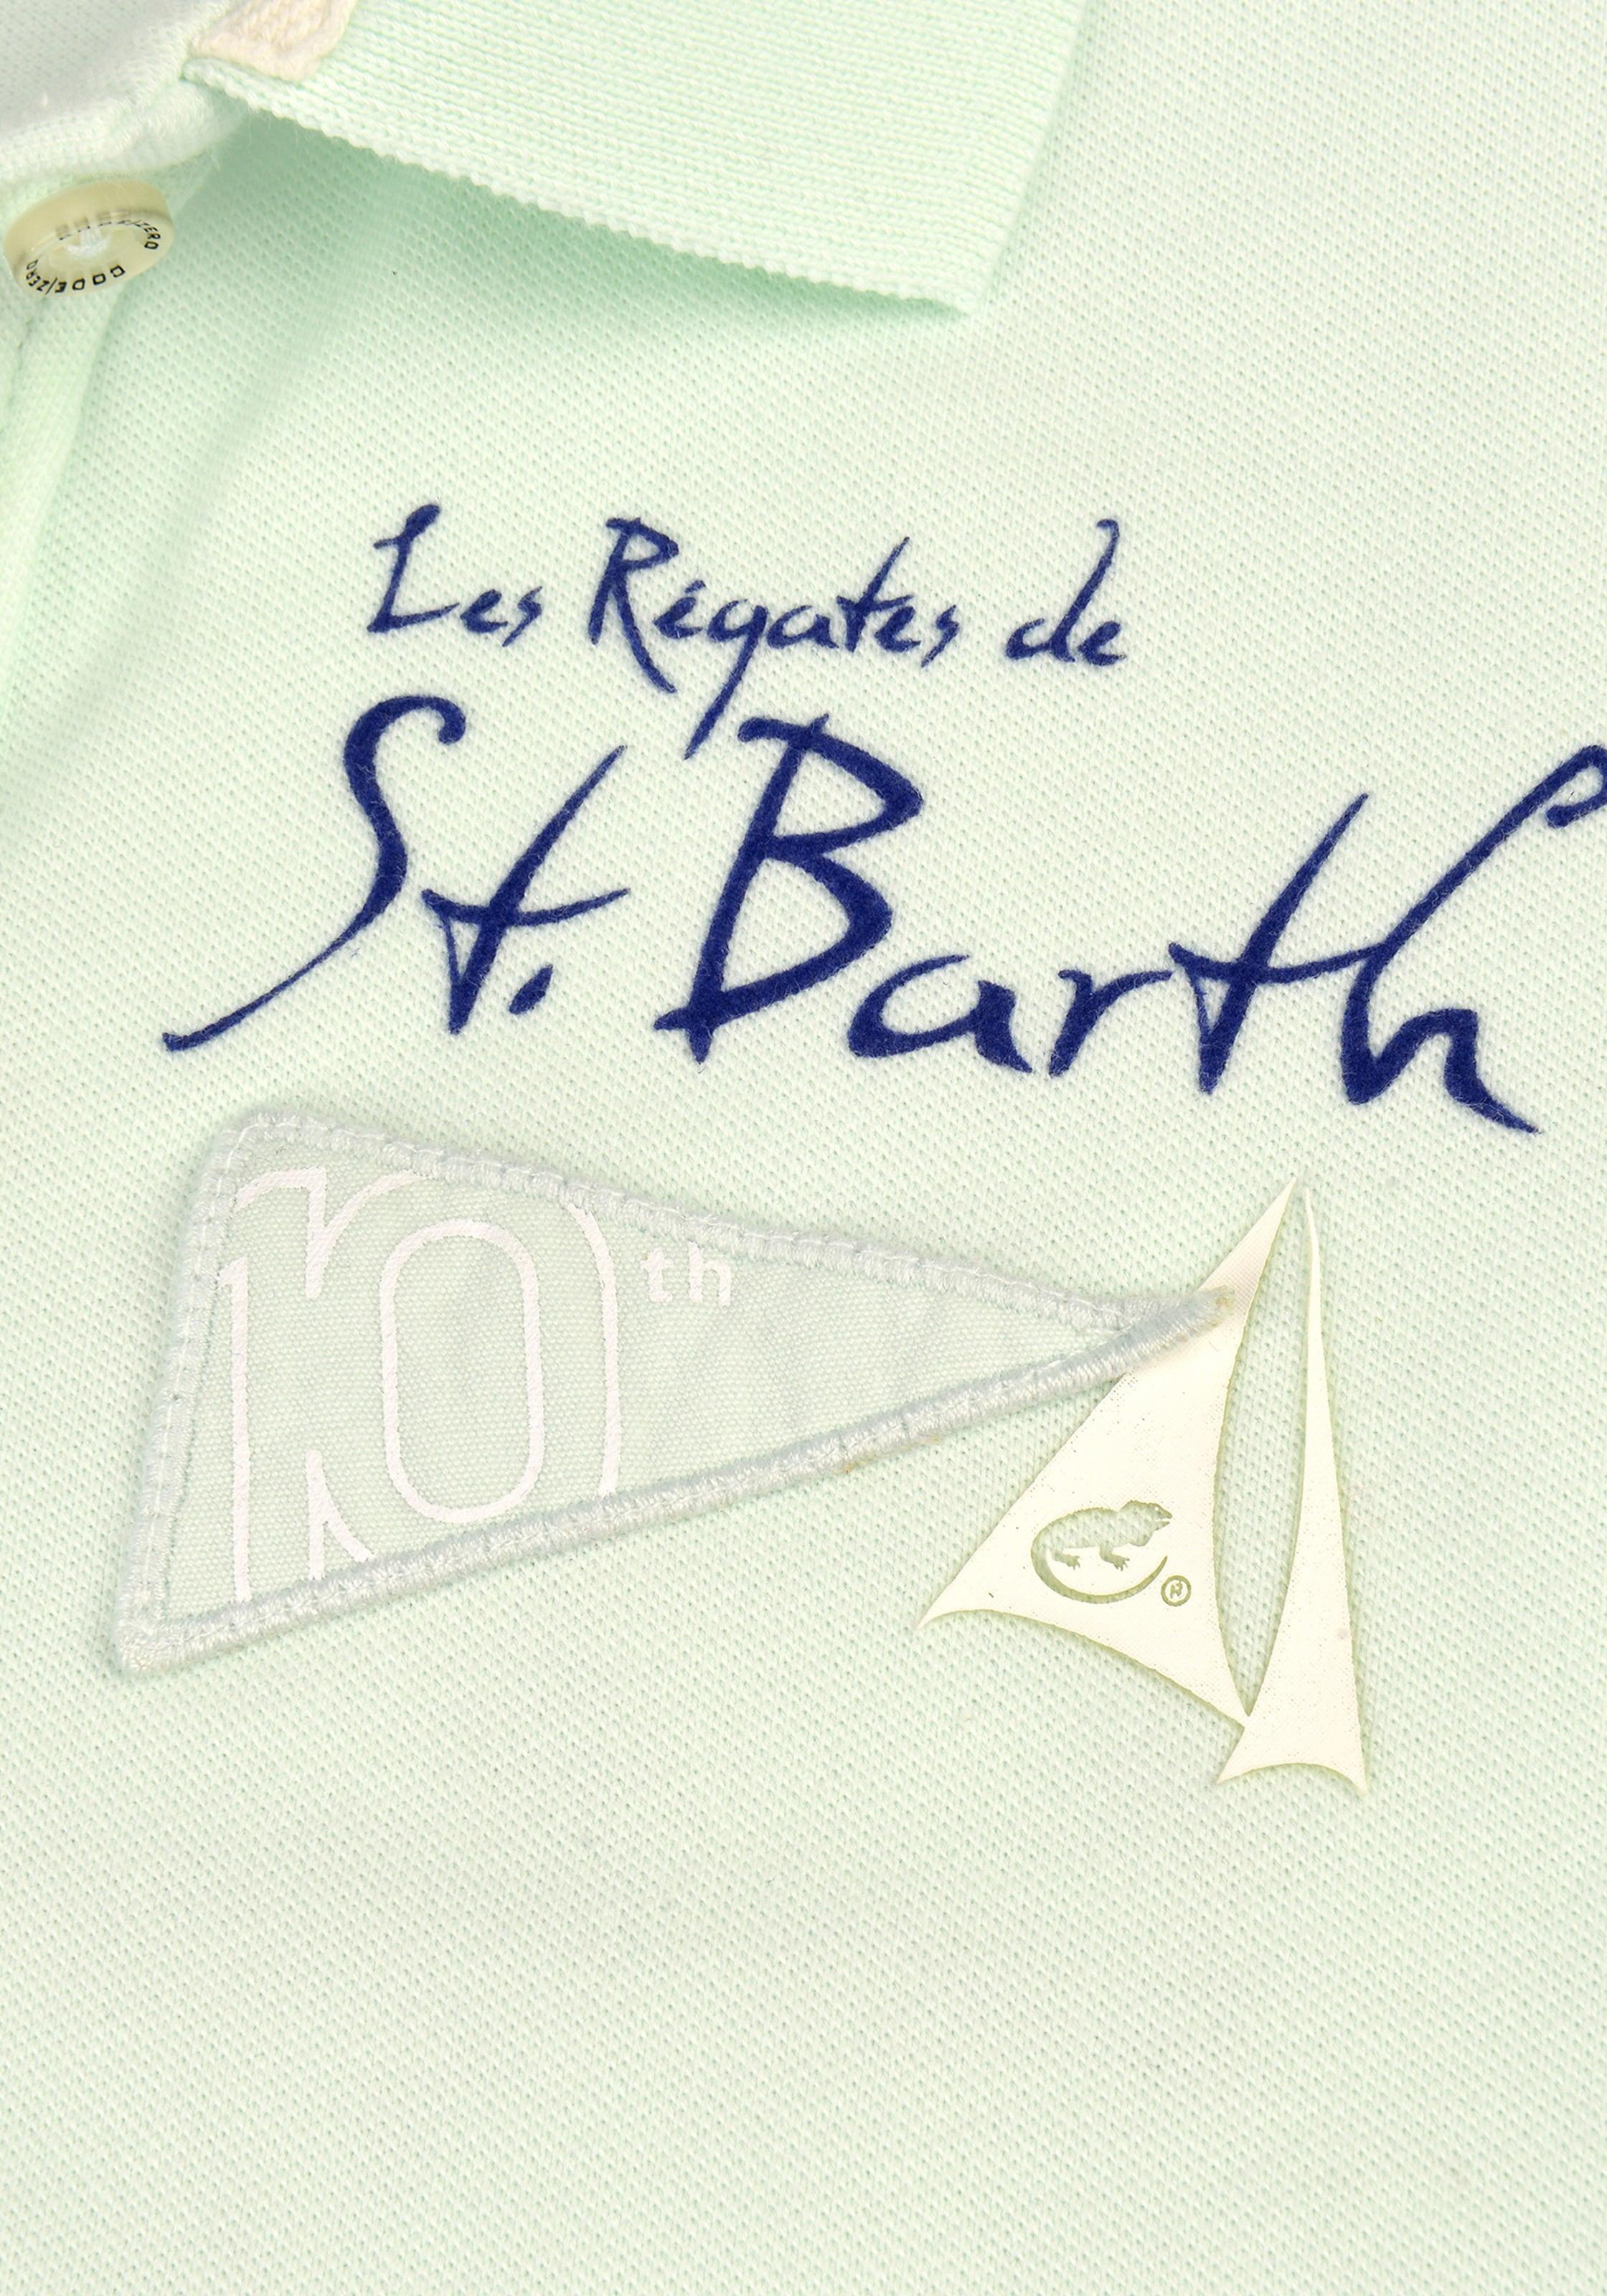 'ss zero Polo Regatta' Pastellgrün Caribbean In Code hQCxsrtd